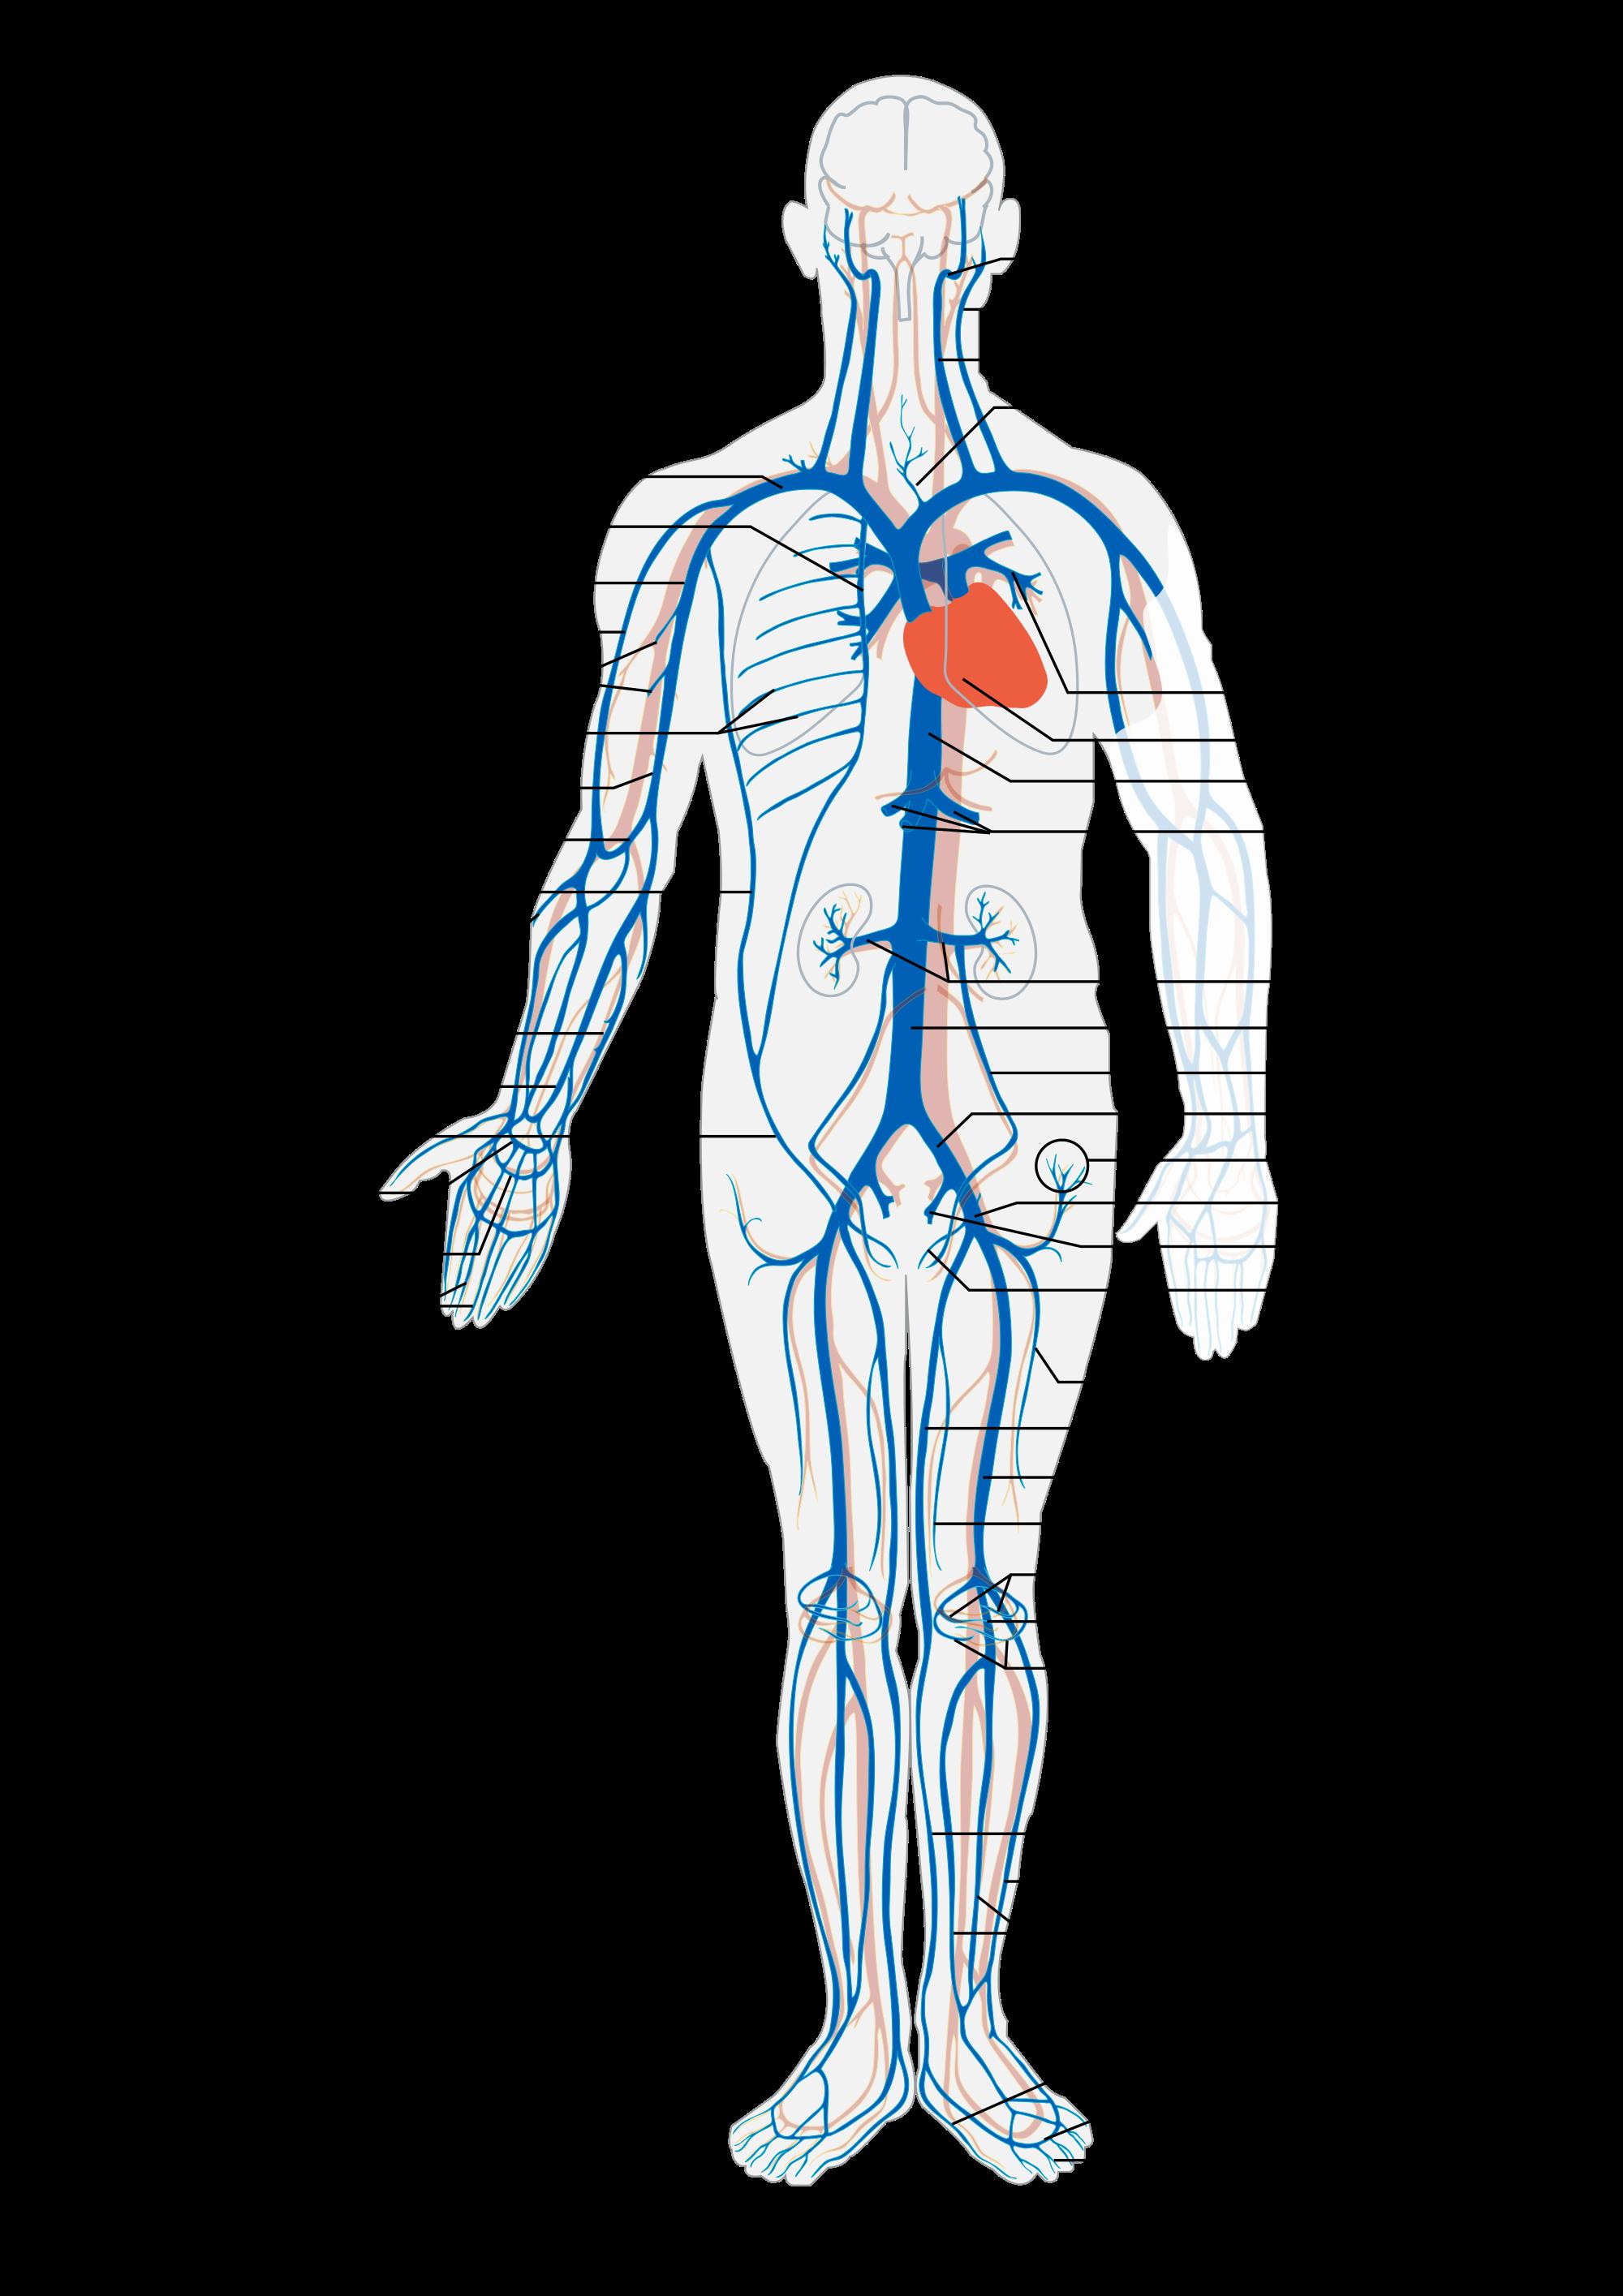 Arteries And Veins Diagram Vein Wikipedia